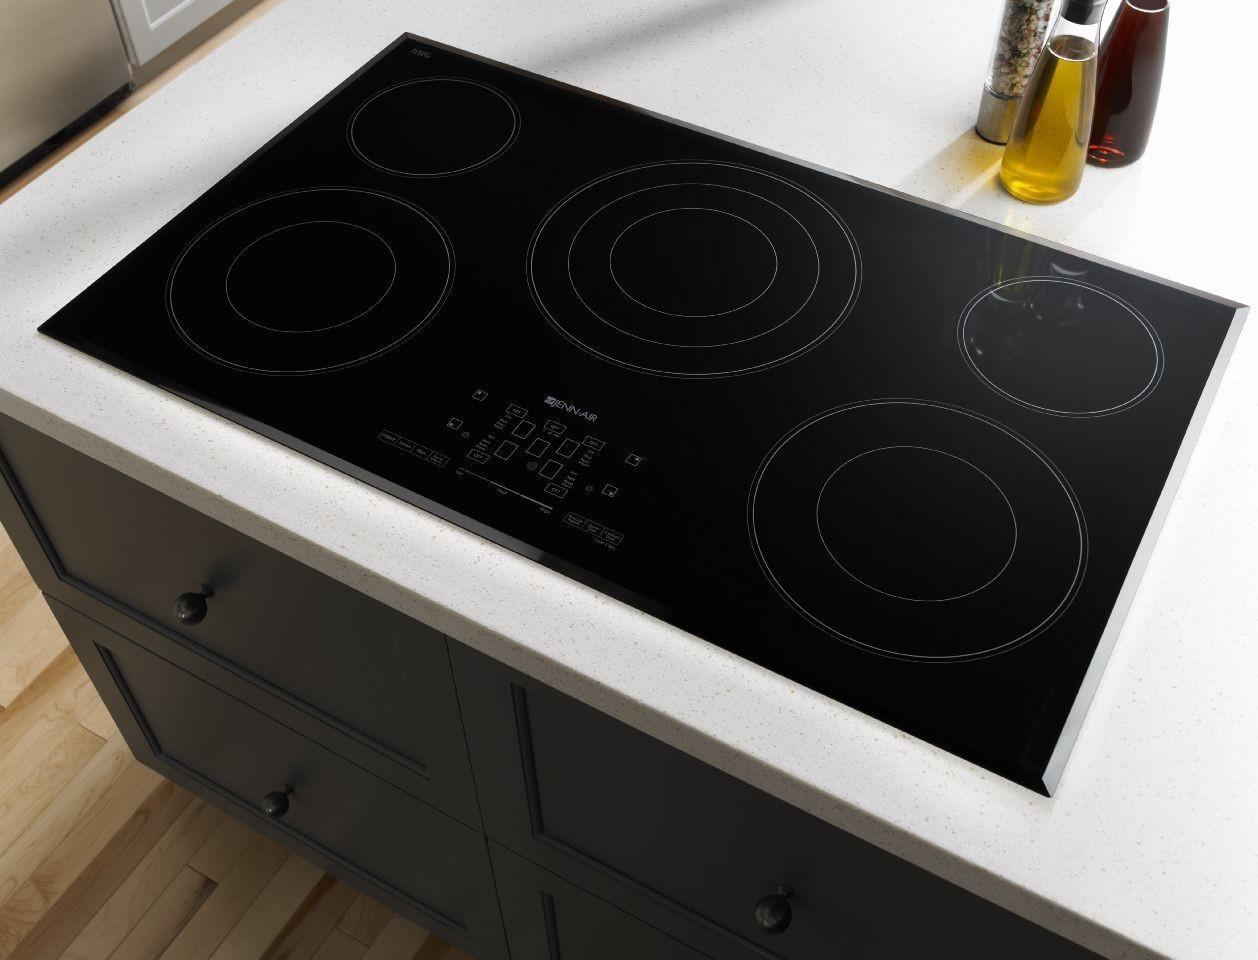 jec4536b jenn air jec4536b electric cooktops. Black Bedroom Furniture Sets. Home Design Ideas